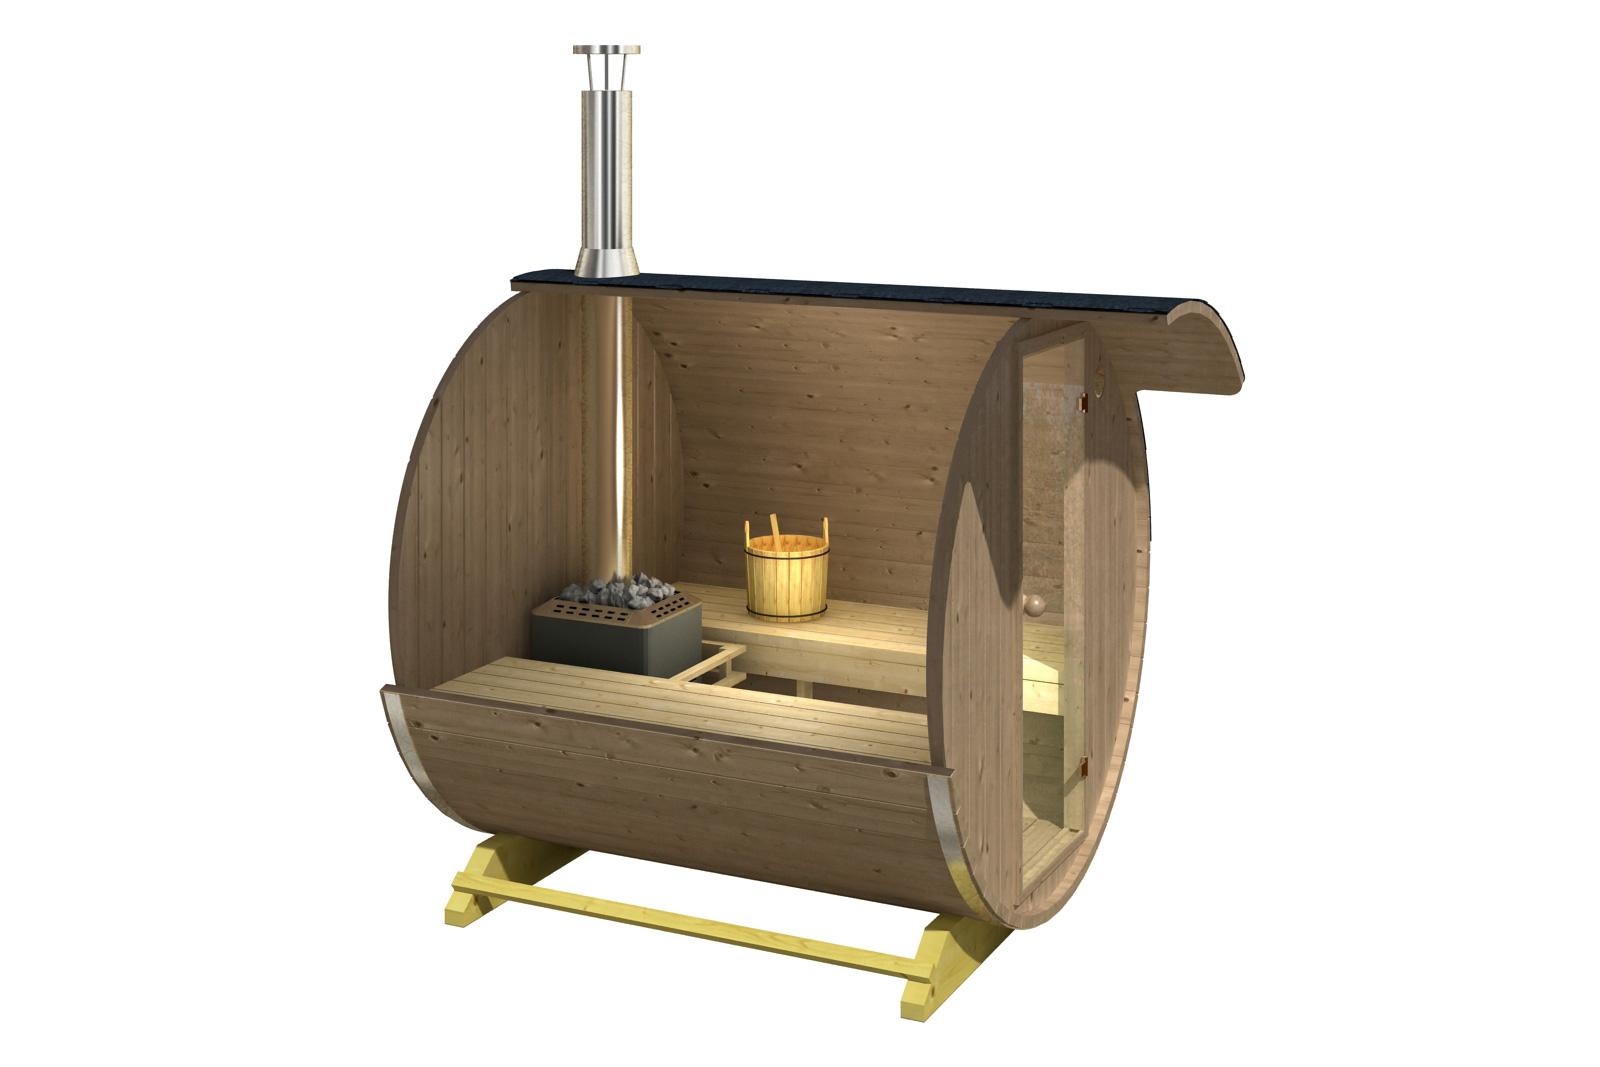 thermoholz fass sauna jonas mit harvia holz ofen